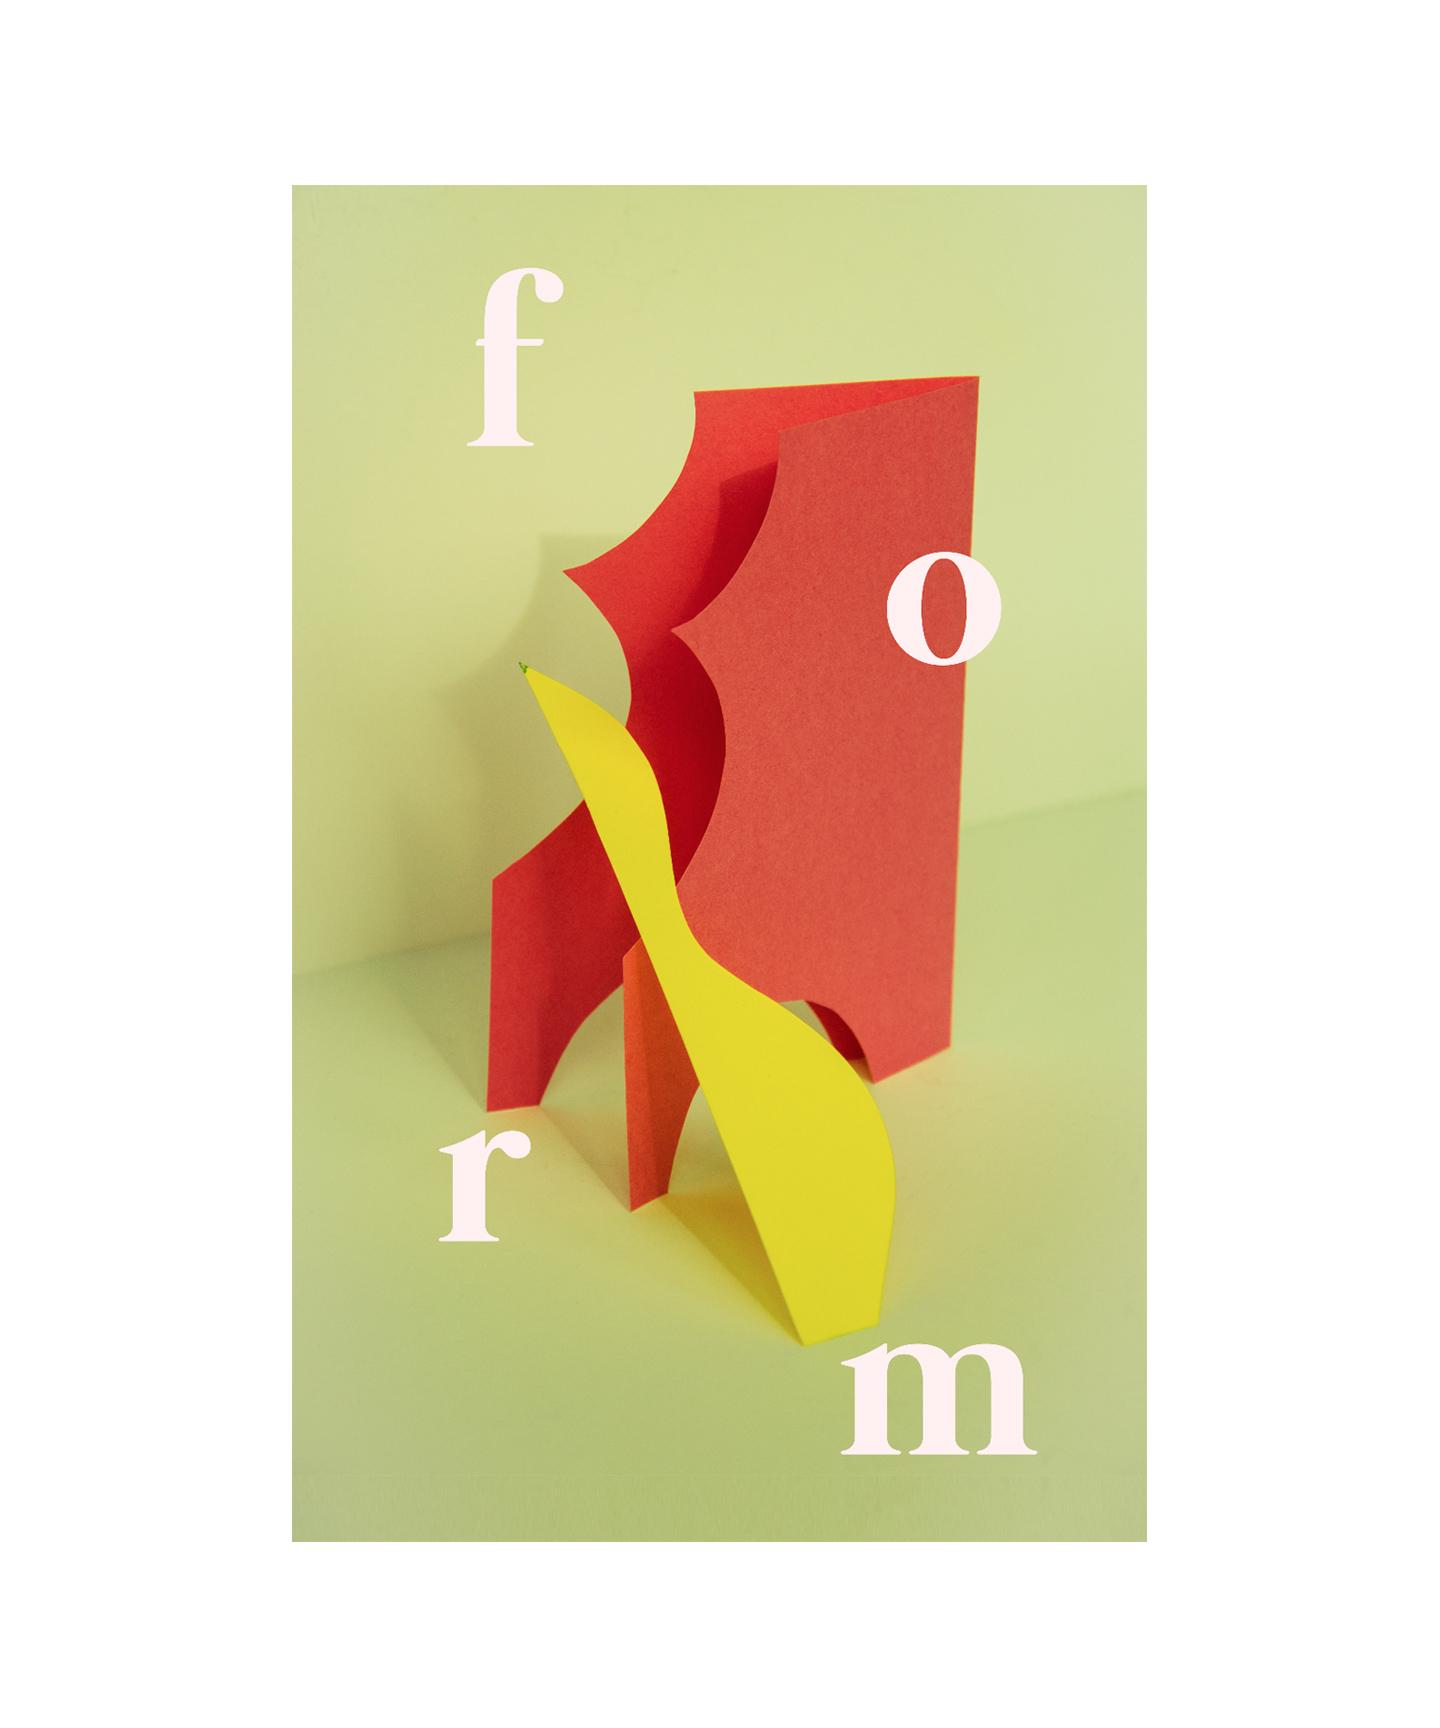 Paper Sculpture Study  design + photography